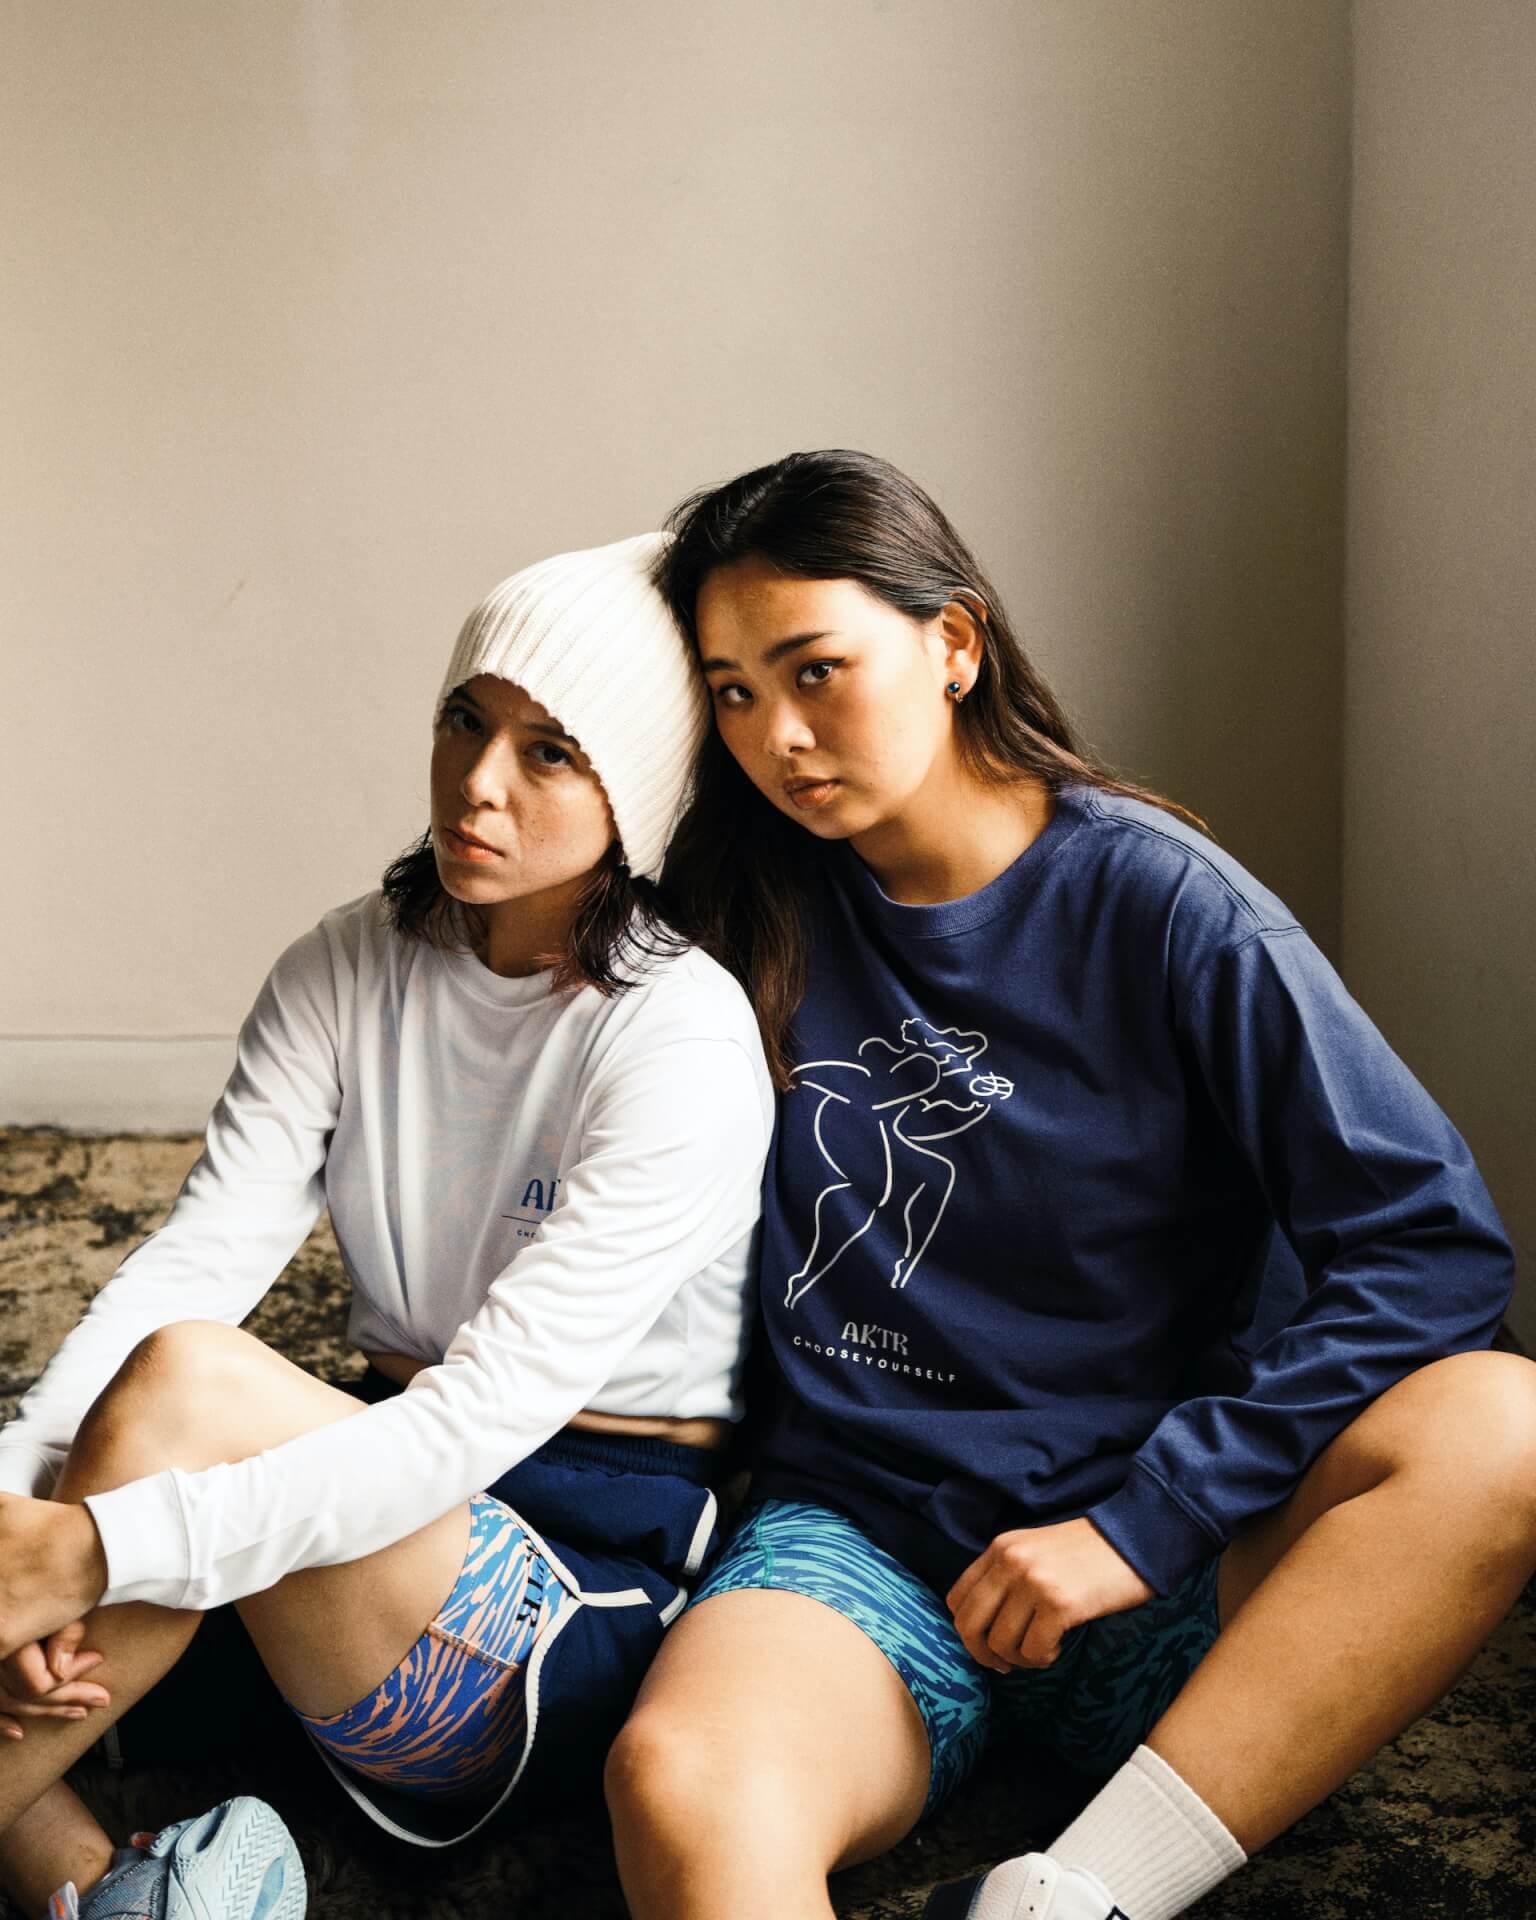 AKTRがオリジナルウィメンズライン「BREEZE collection」を発売決定!ルックに女子プロバスケットボール選手の馬瓜ステファニーらが起用 life210924_aktr_breez_015